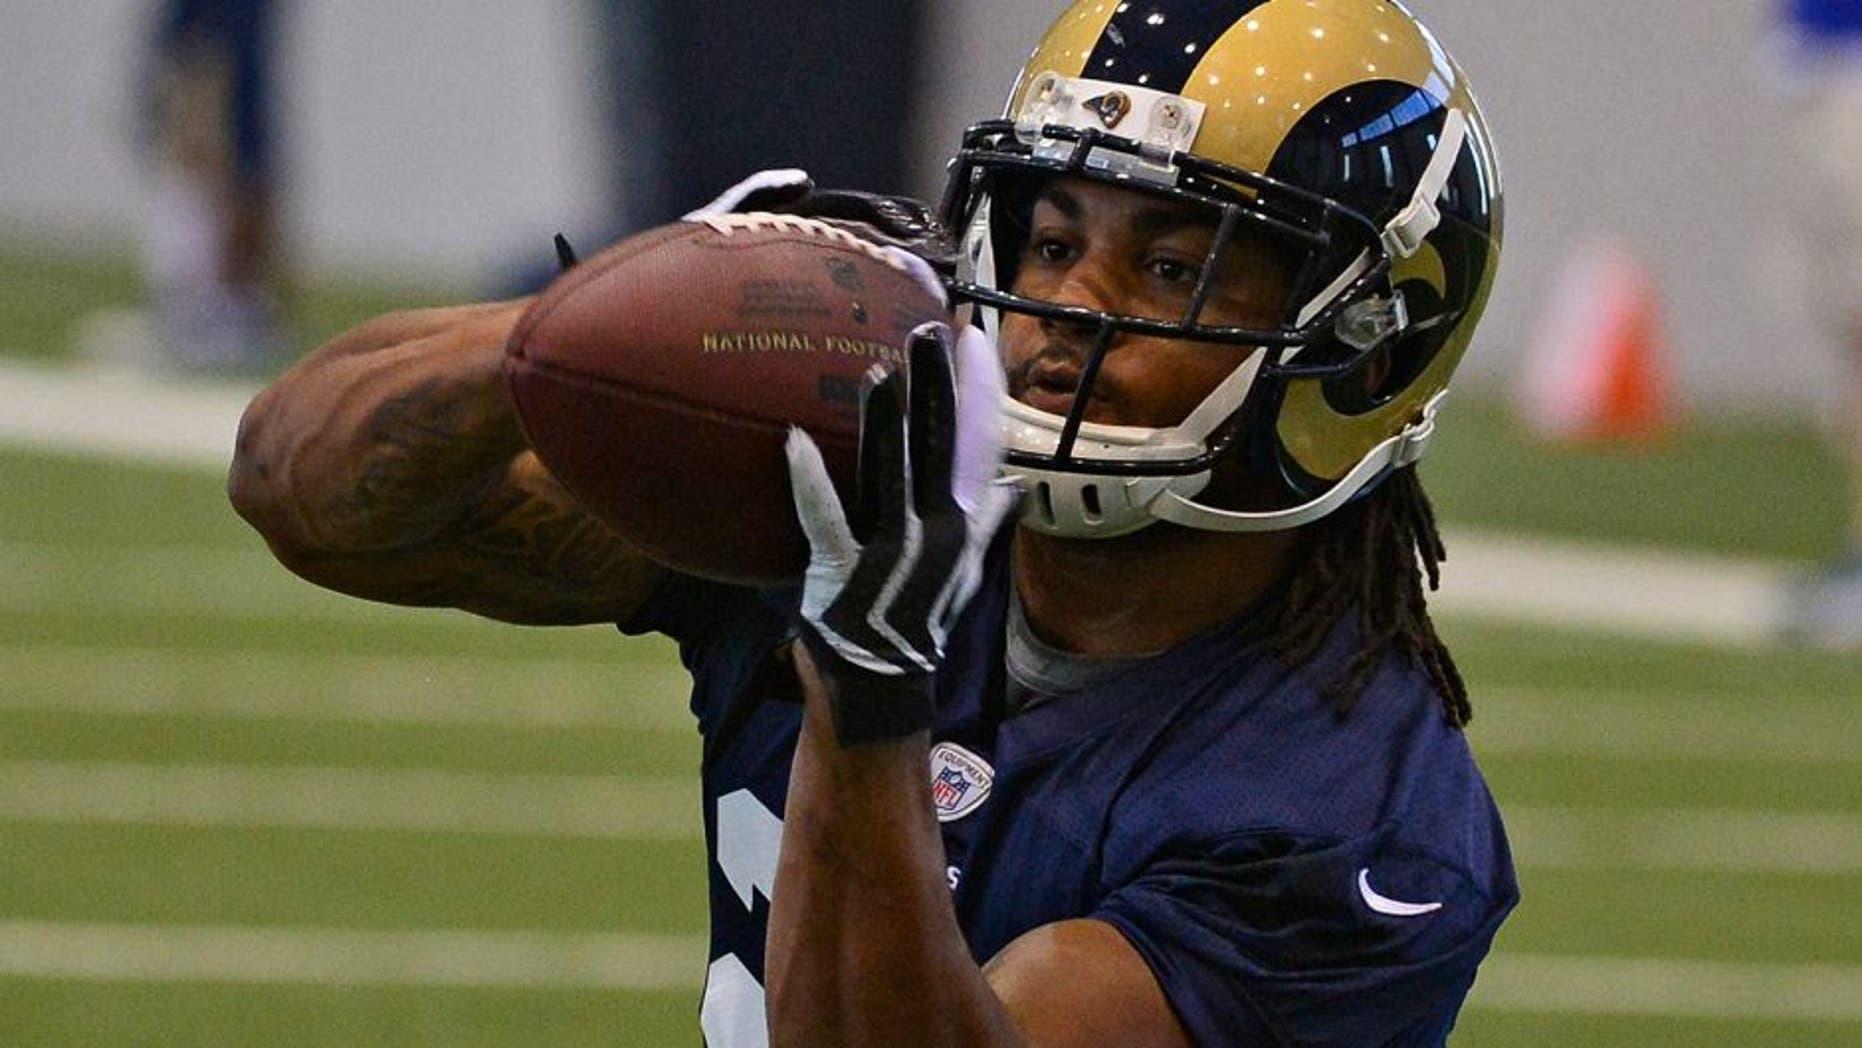 Jul 22, 2014; St. Louis, MO, USA; St. Louis Rams running back Tre Mason (27) runs through drills at Rams Park. Mandatory Credit: Jeff Curry-USA TODAY Sports